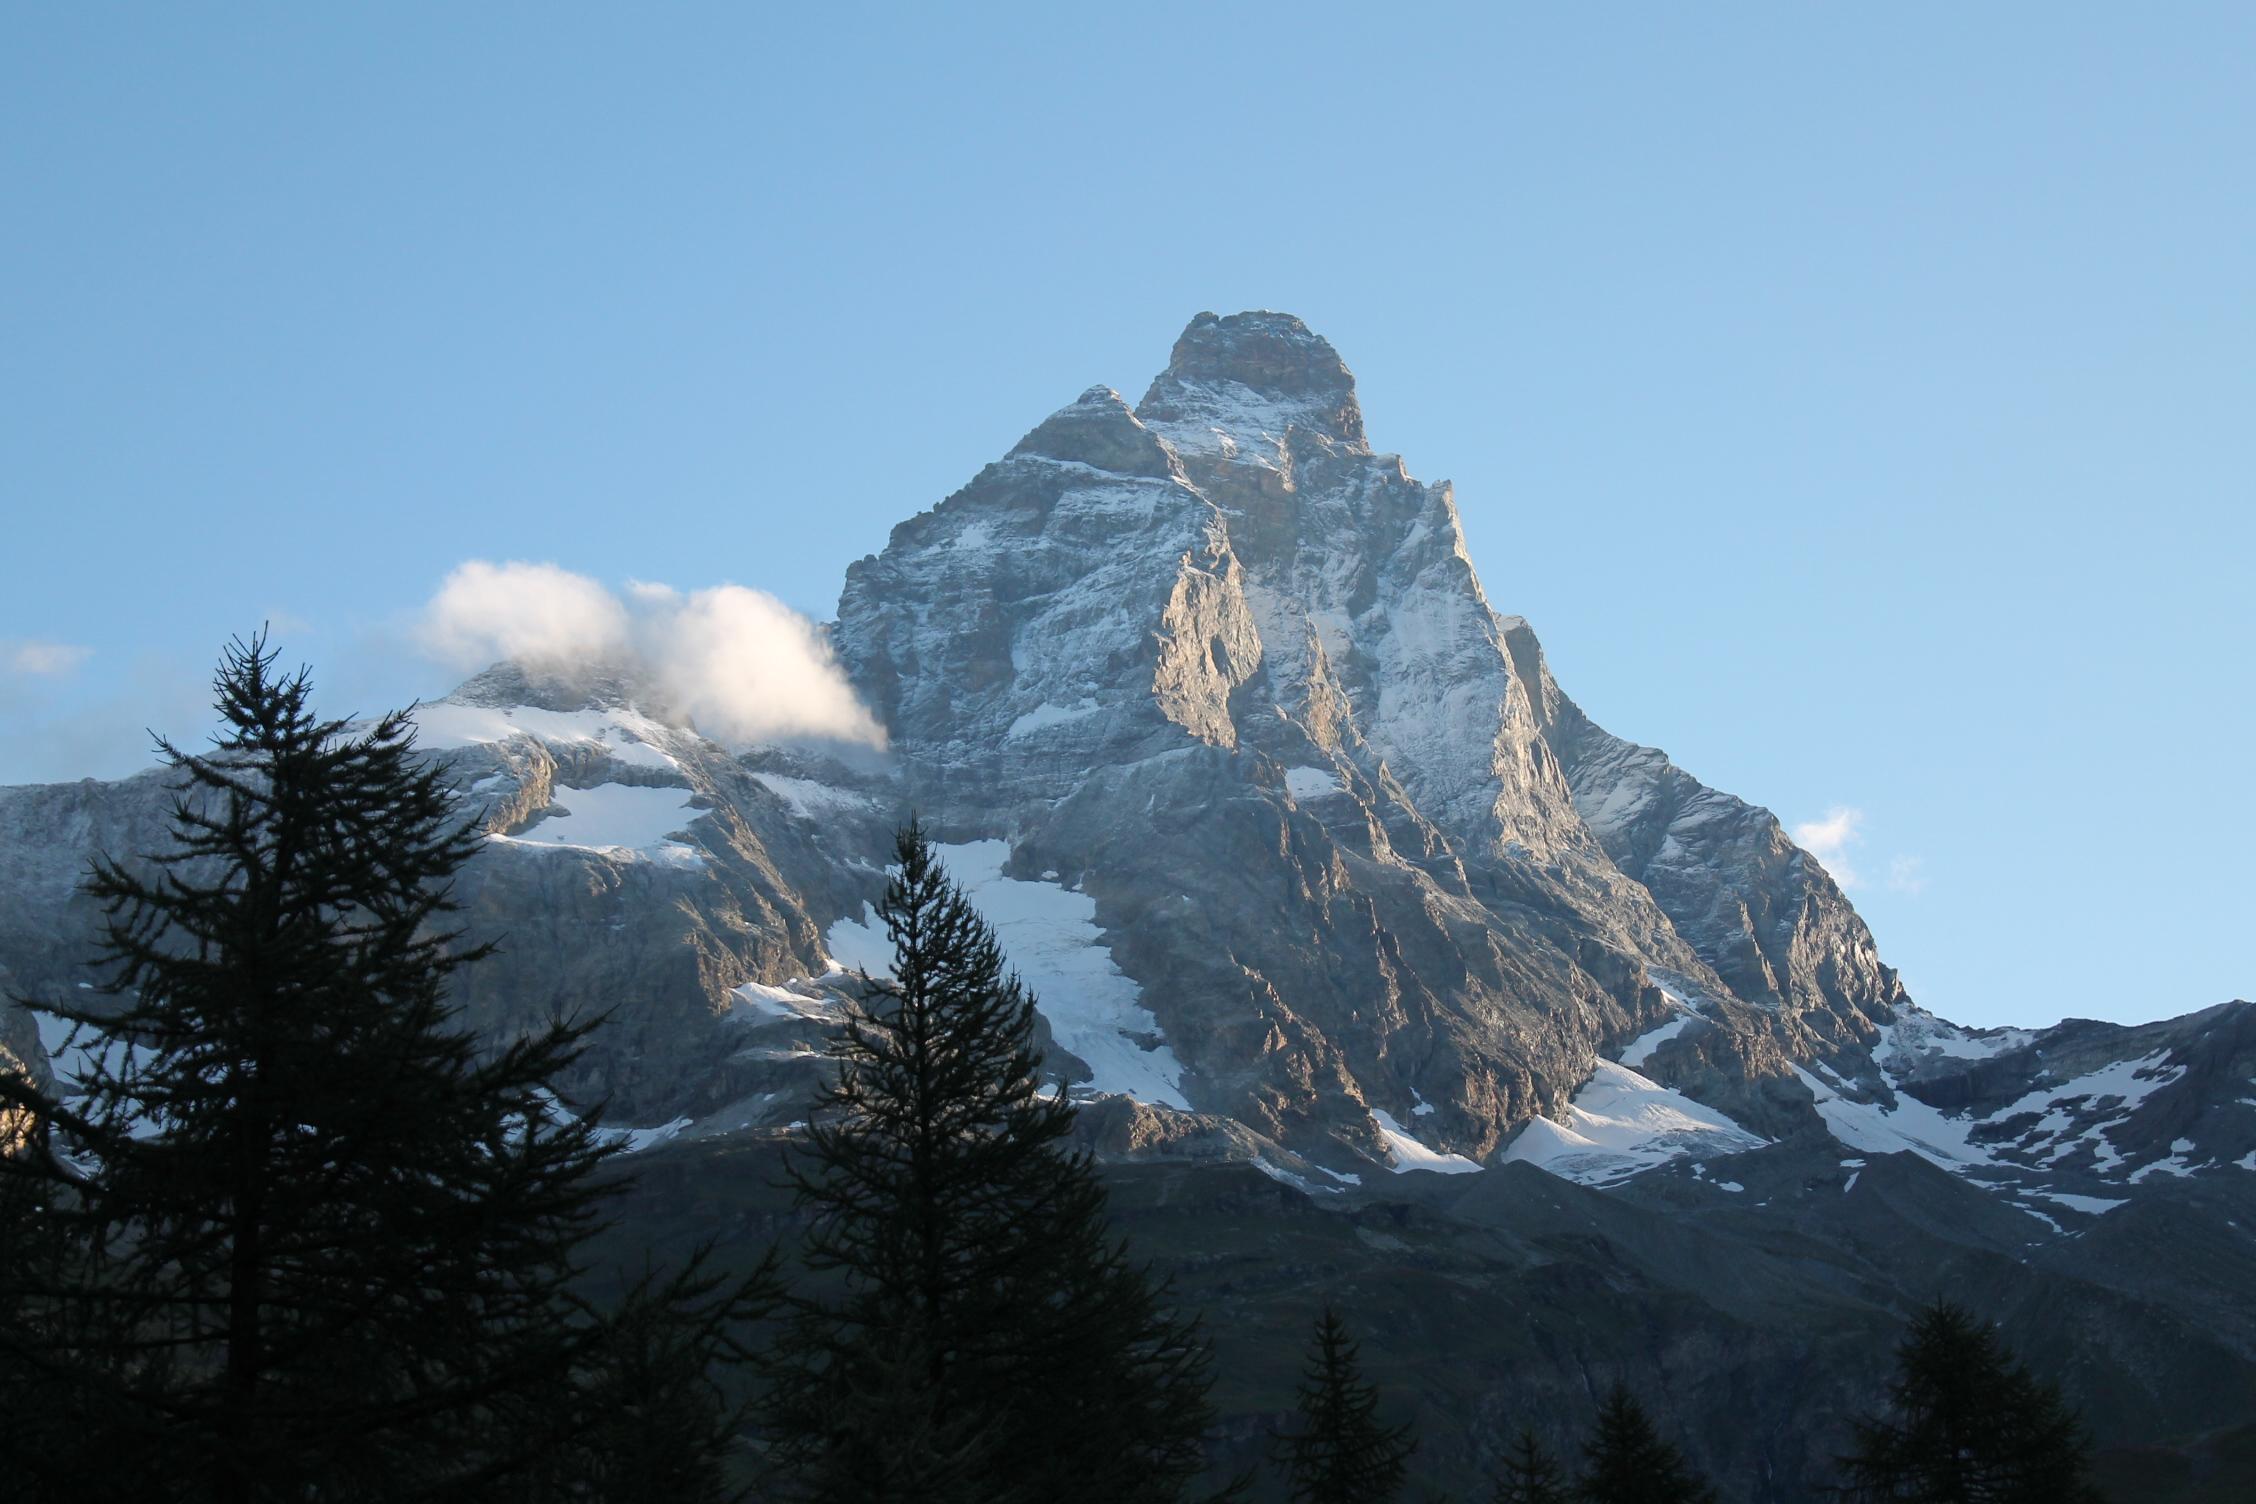 I cittadini vanno in montagna